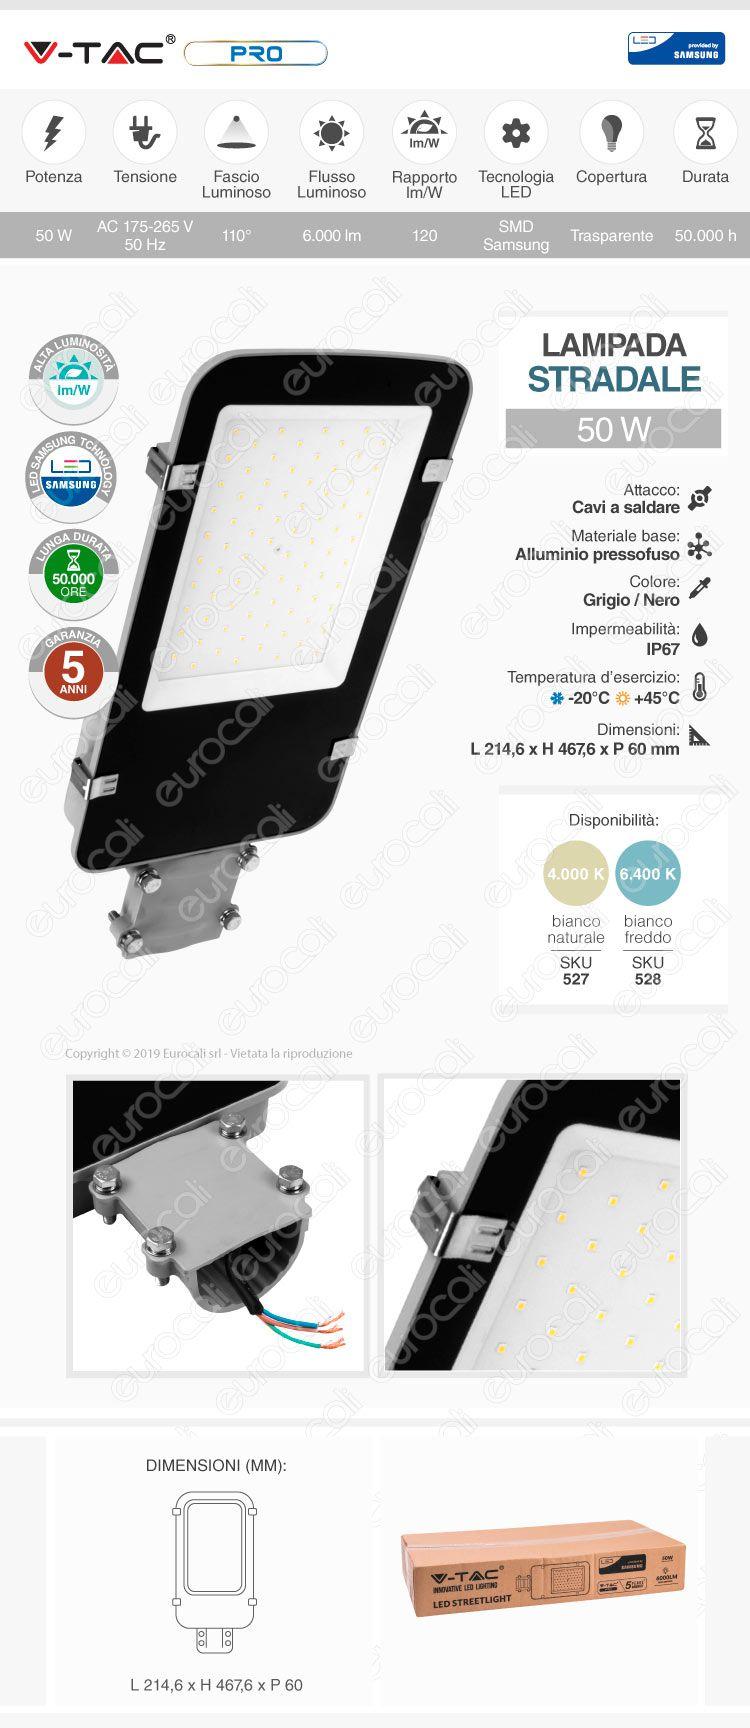 V-Tac PRO VT-50ST Lampada Stradale LED 50W Lampione SMD Chip Samsung